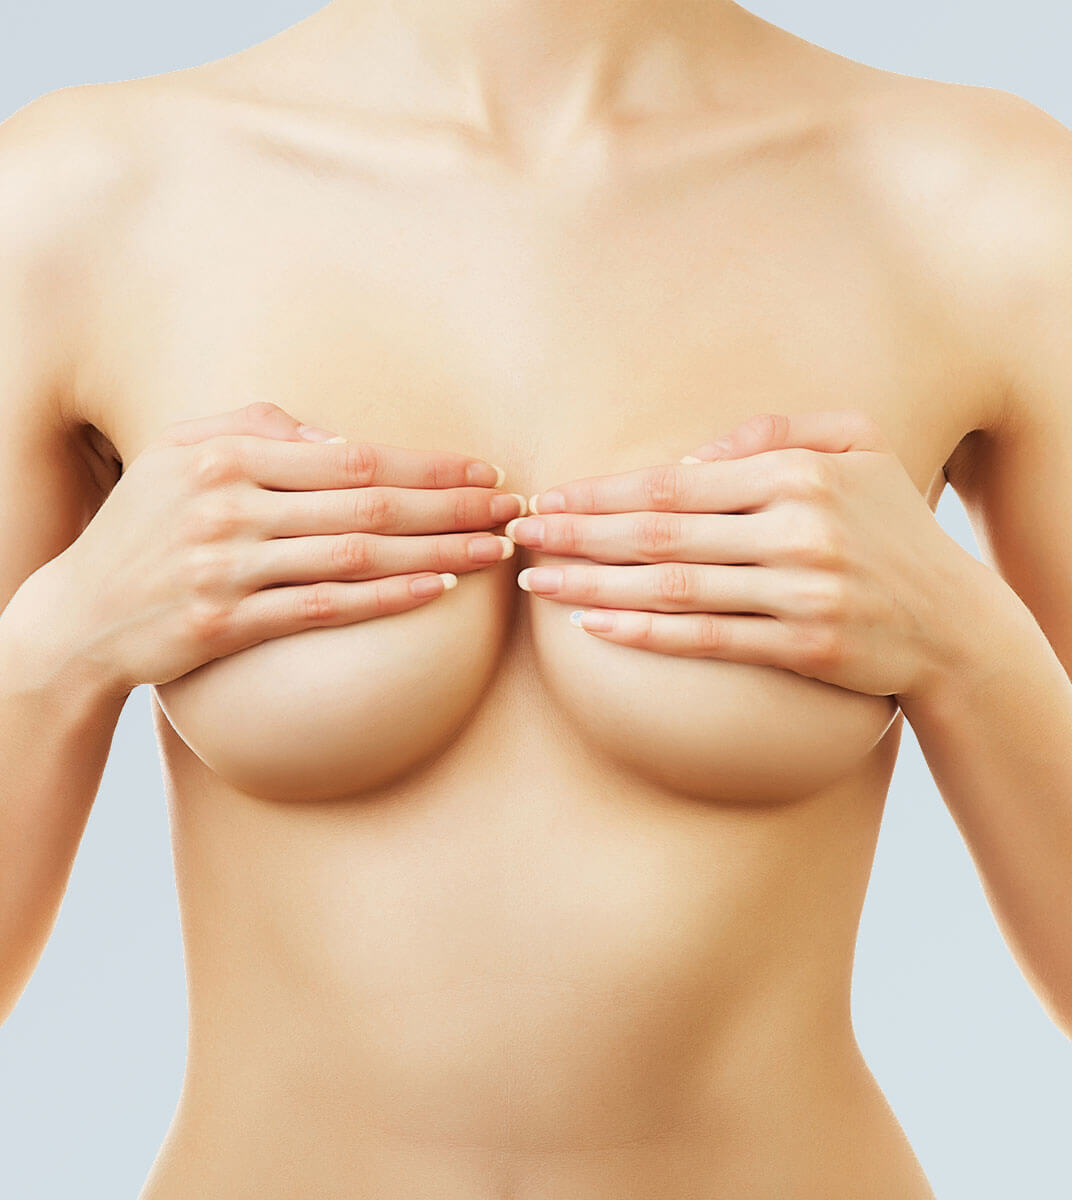 Brustvergrößerung Schönheitsoperation